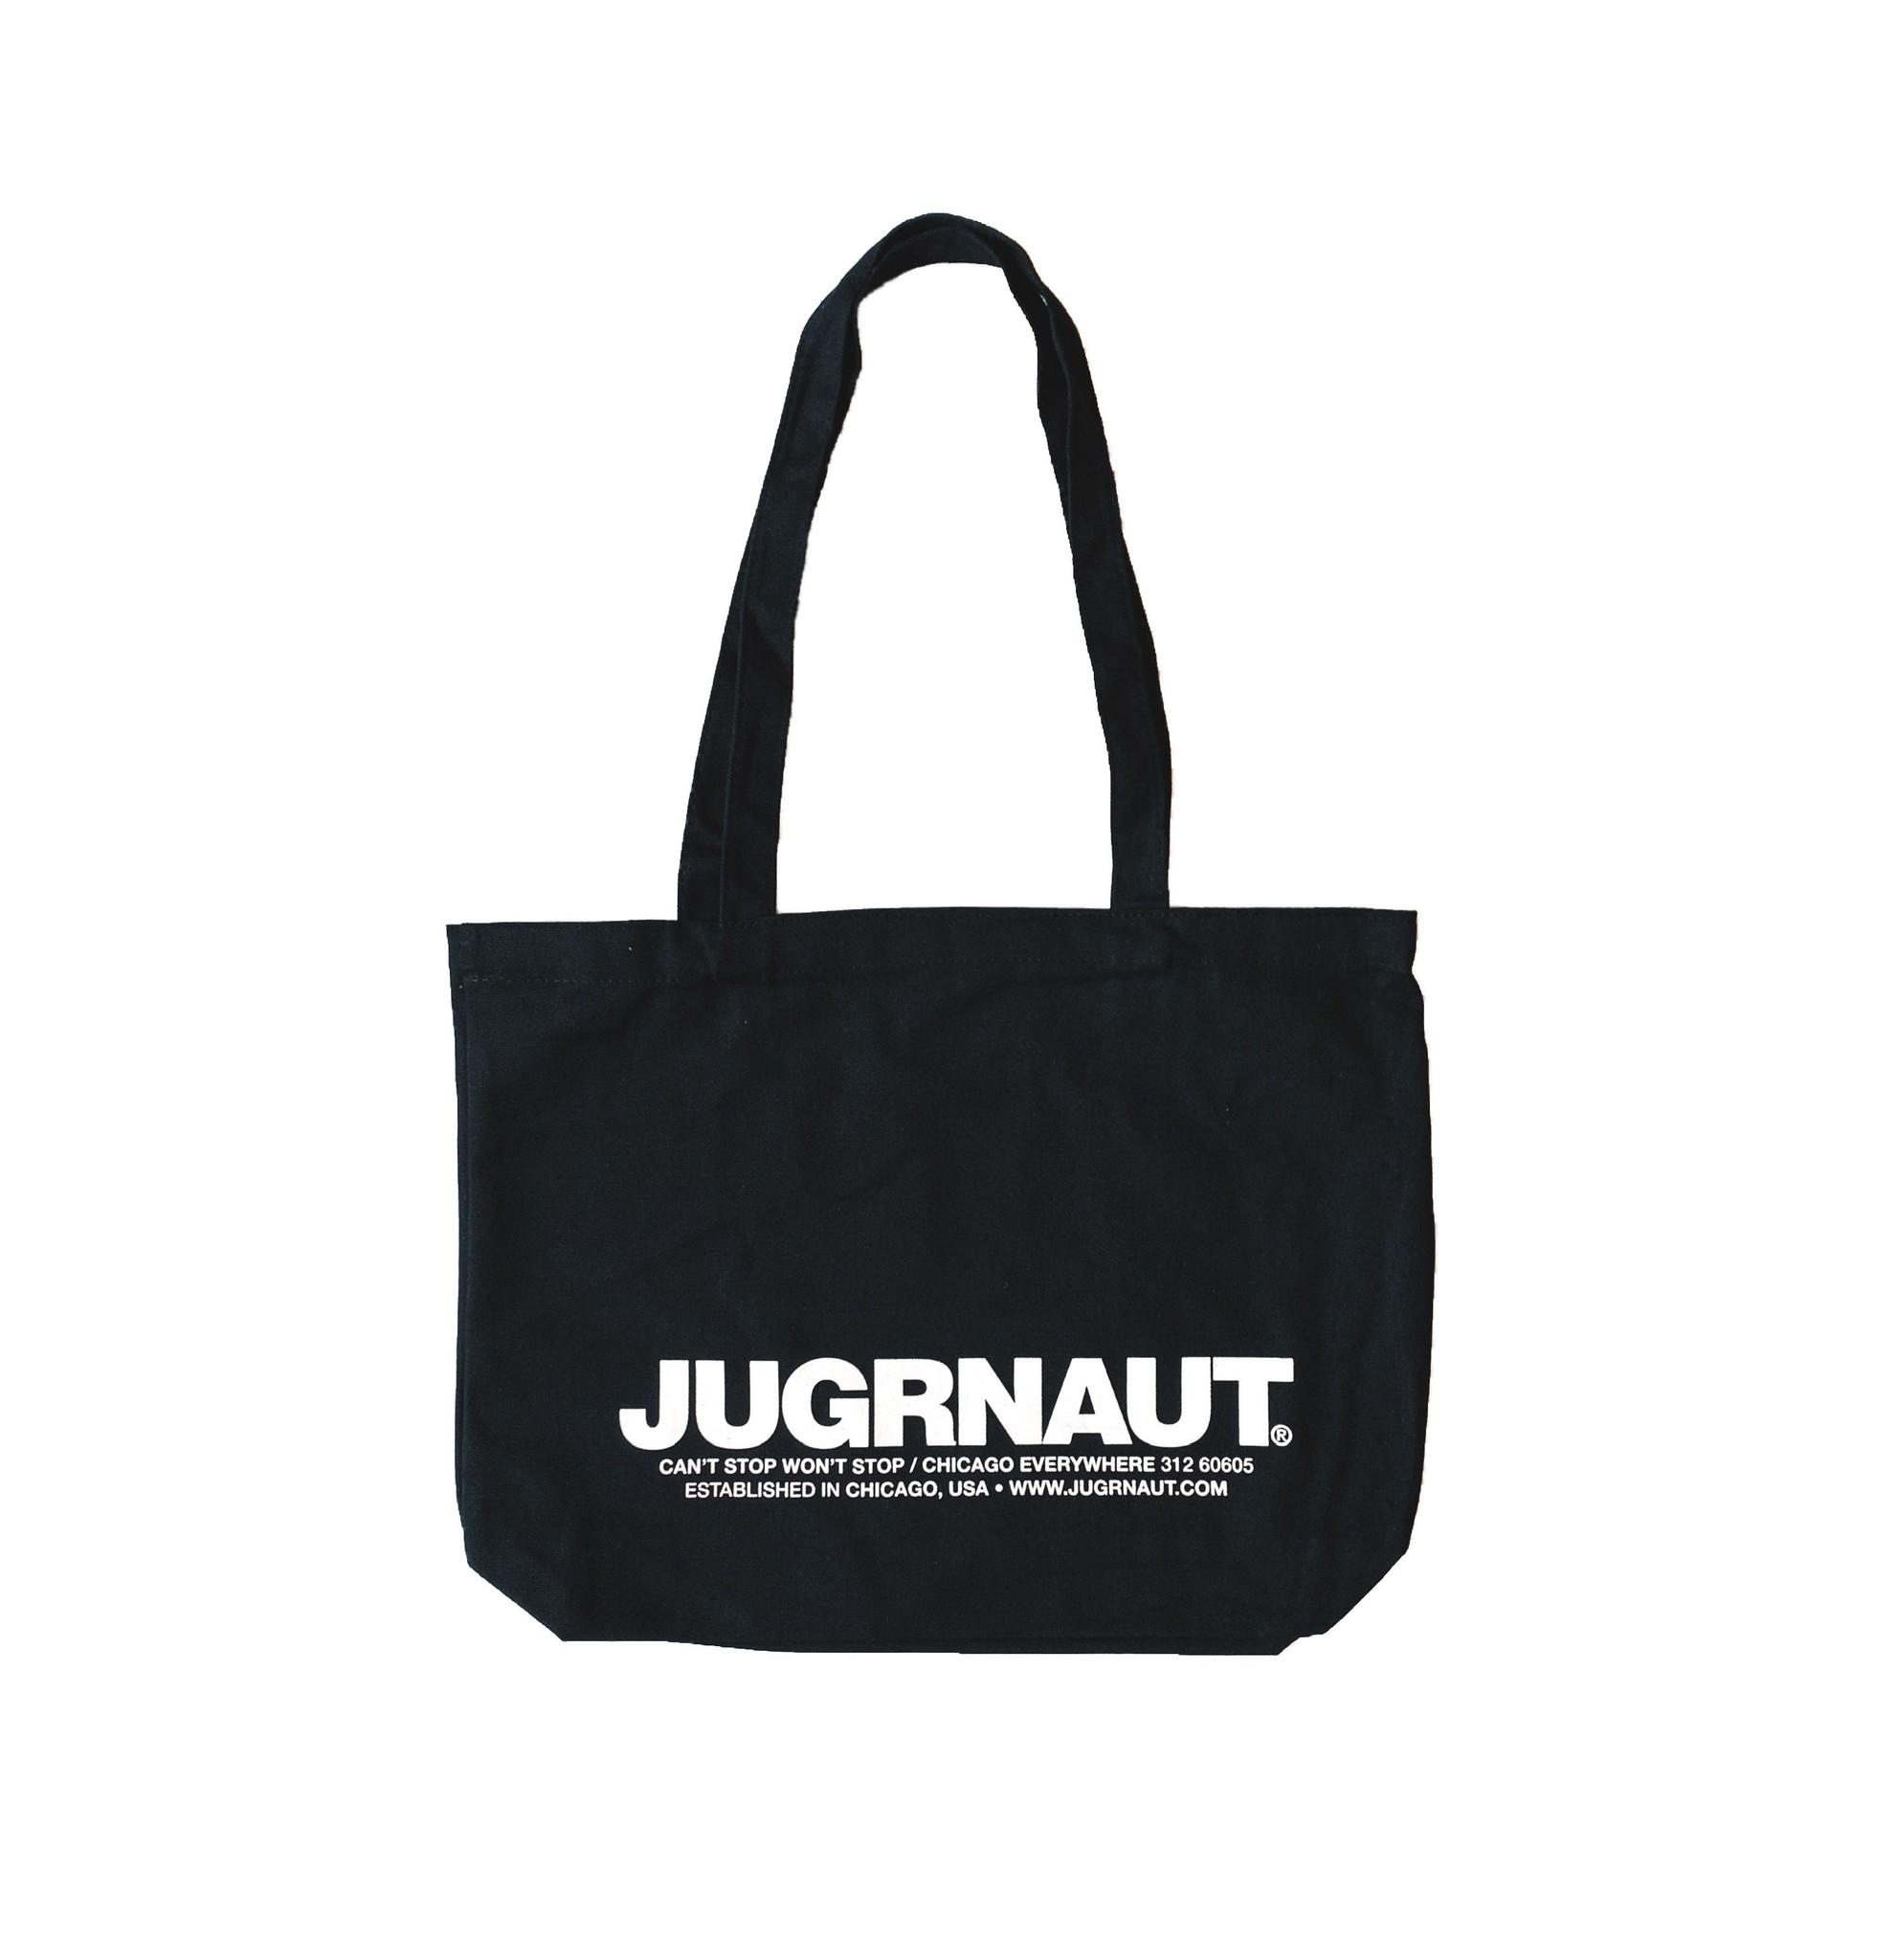 Jugrnaut Jugrnaut Heavy Duty Shield/ Spellout Tote Bag